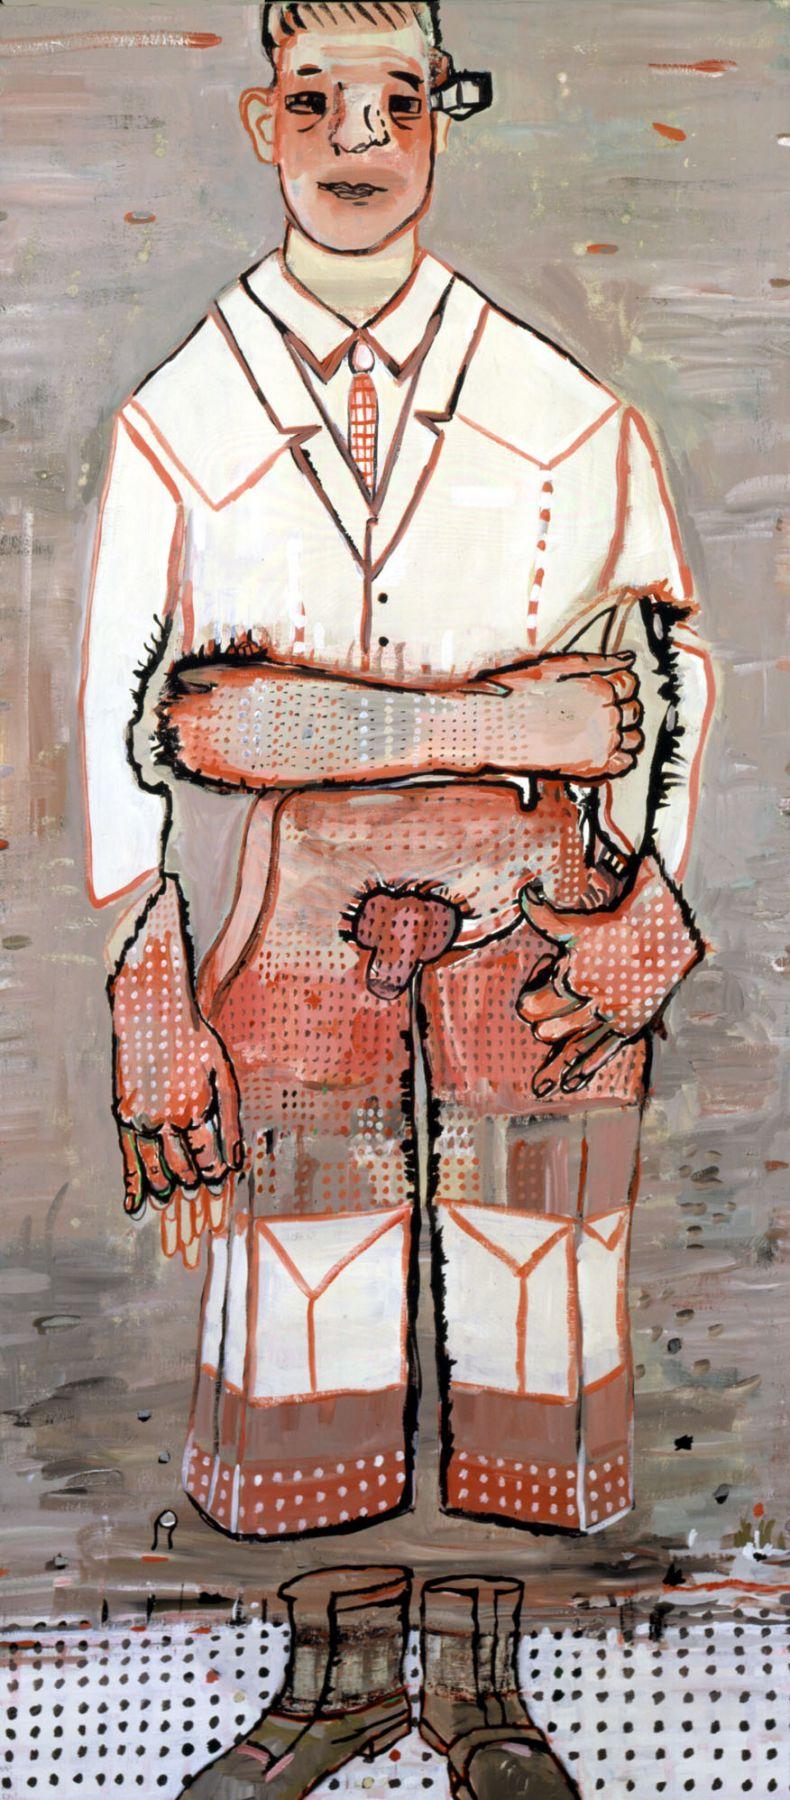 No Body, 2004, Acrylic on canvas